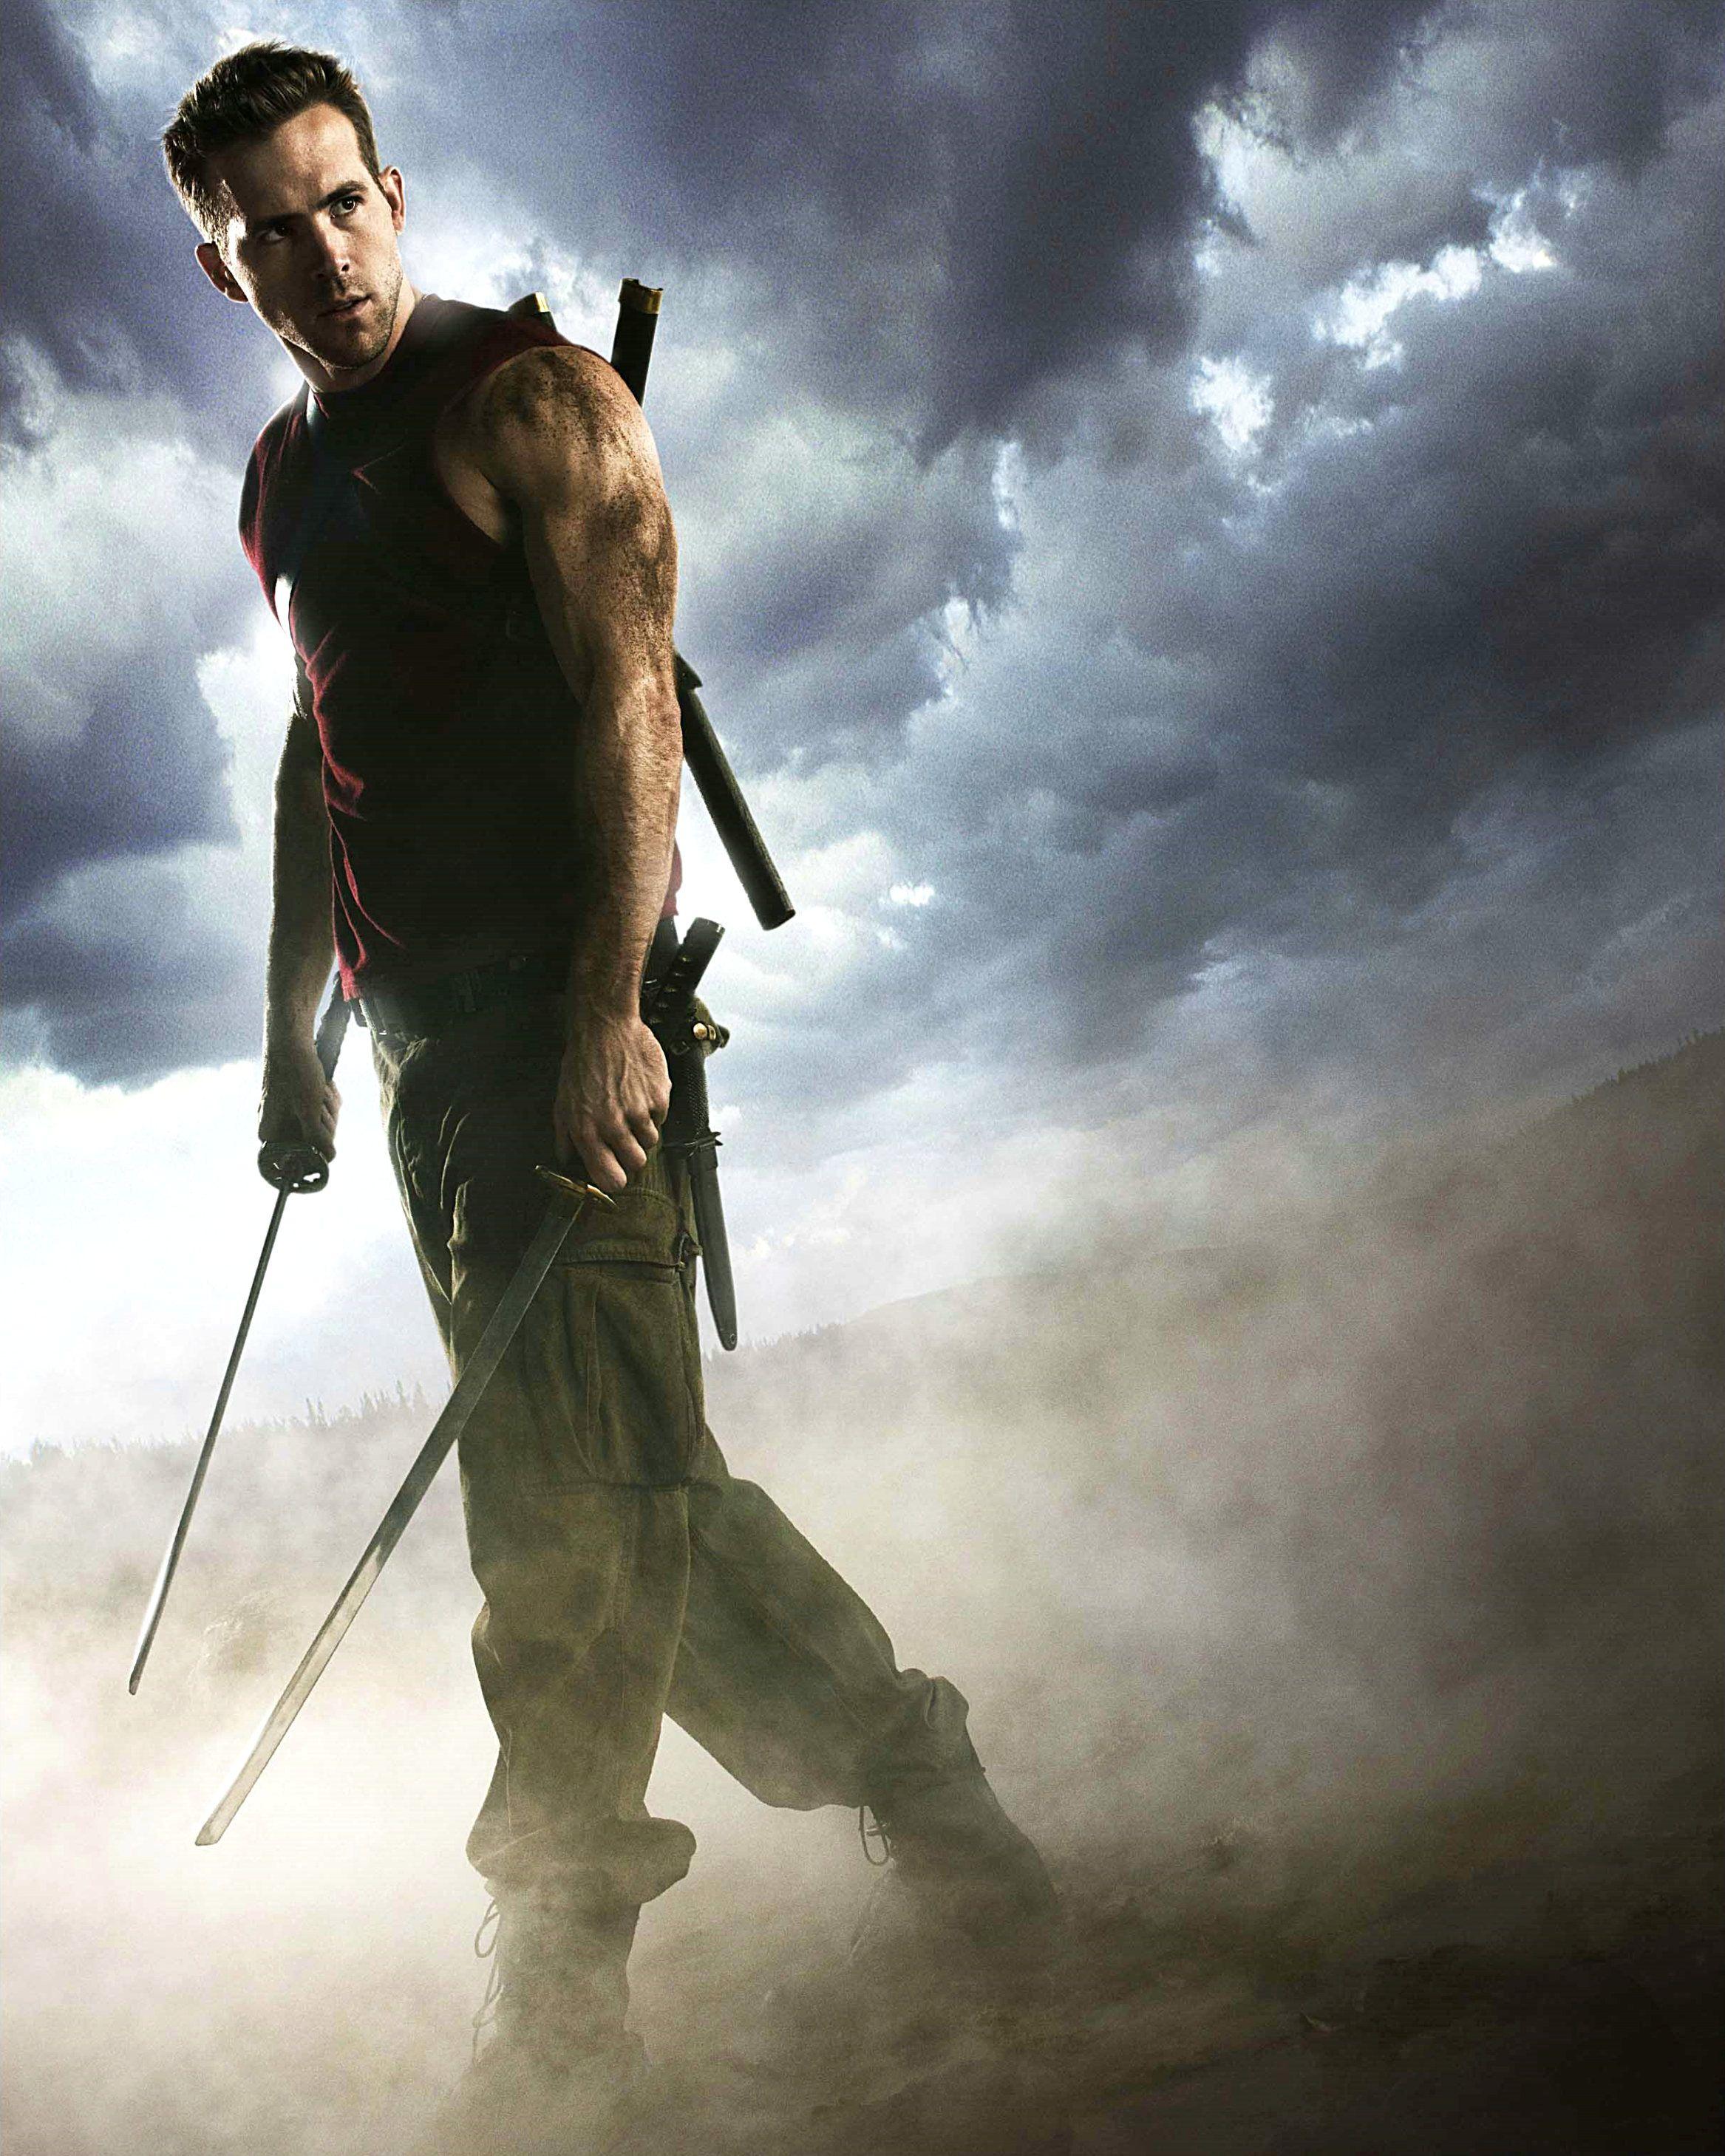 Ryan Reynolds as Deadpool